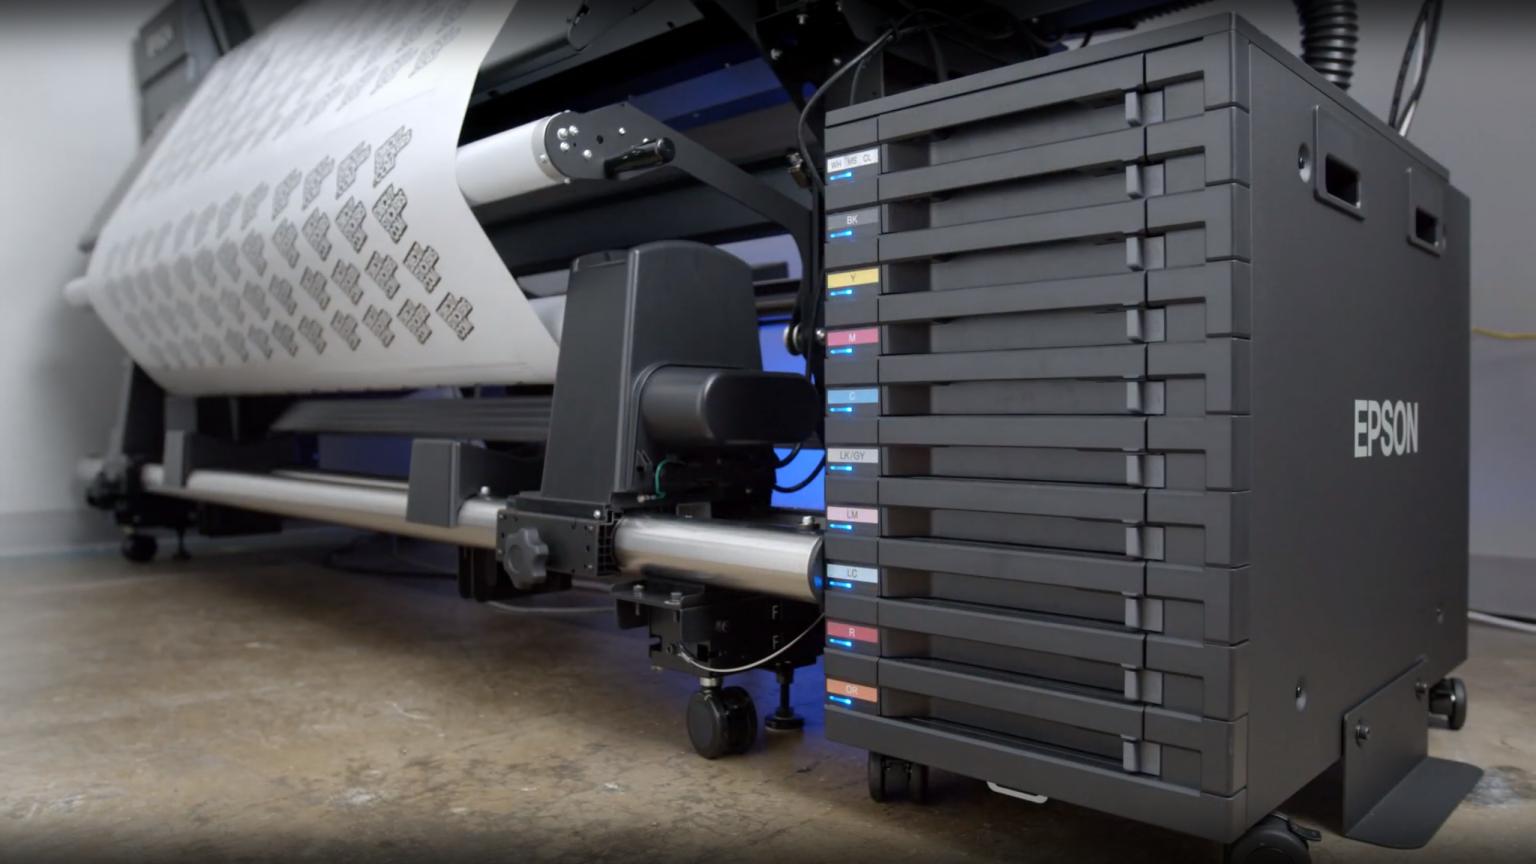 Epson s60600L bulk printer